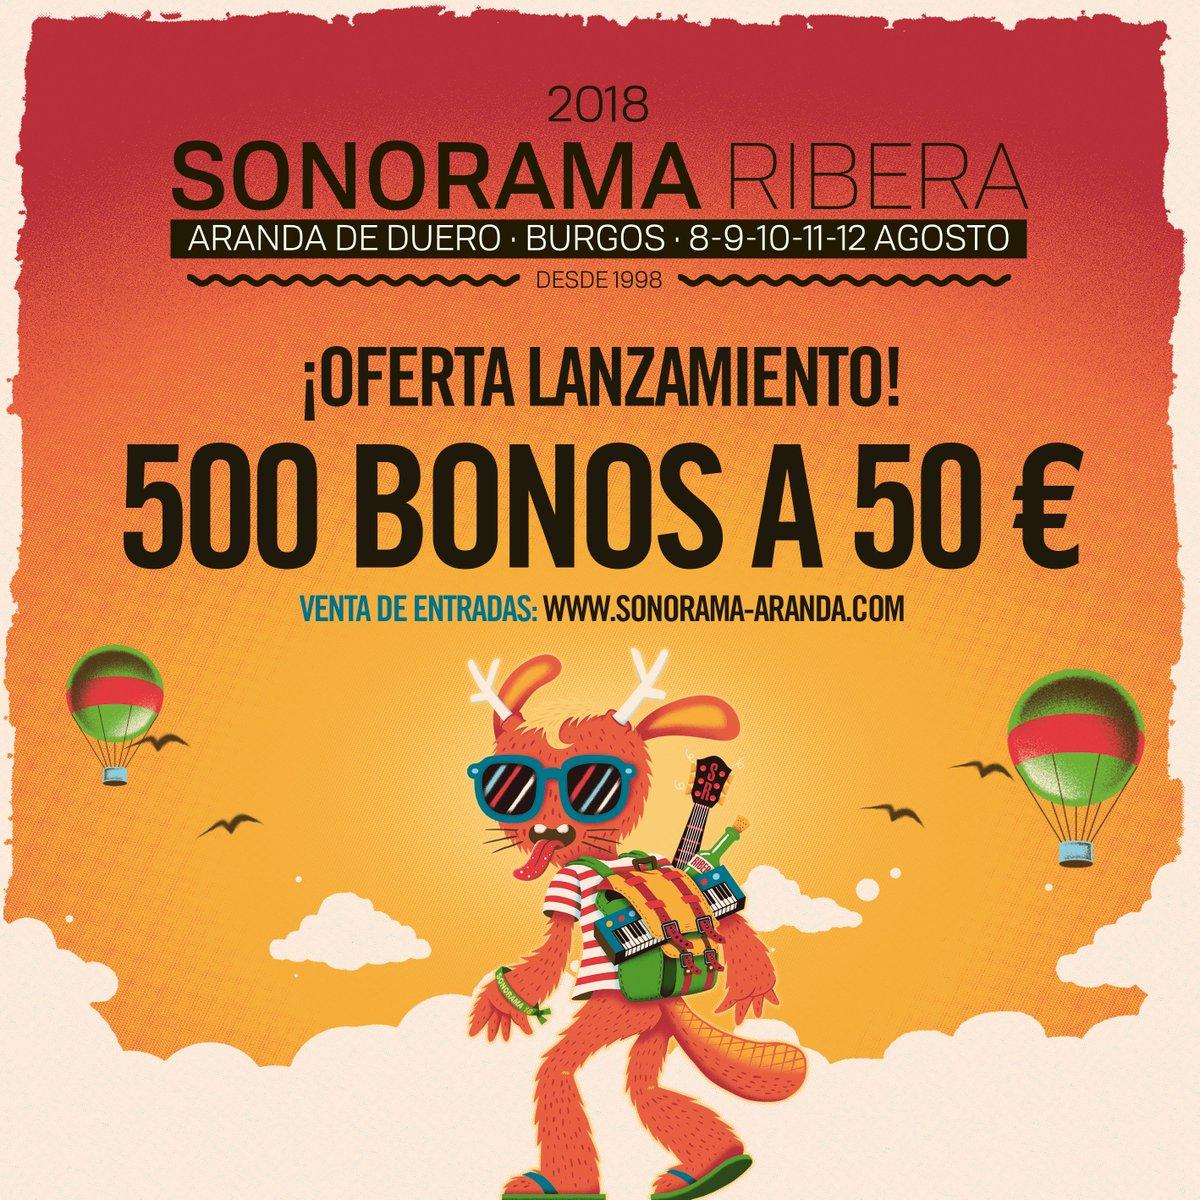 Sonorama 2019 - Página 7 DNITrgHXkAA3iWh